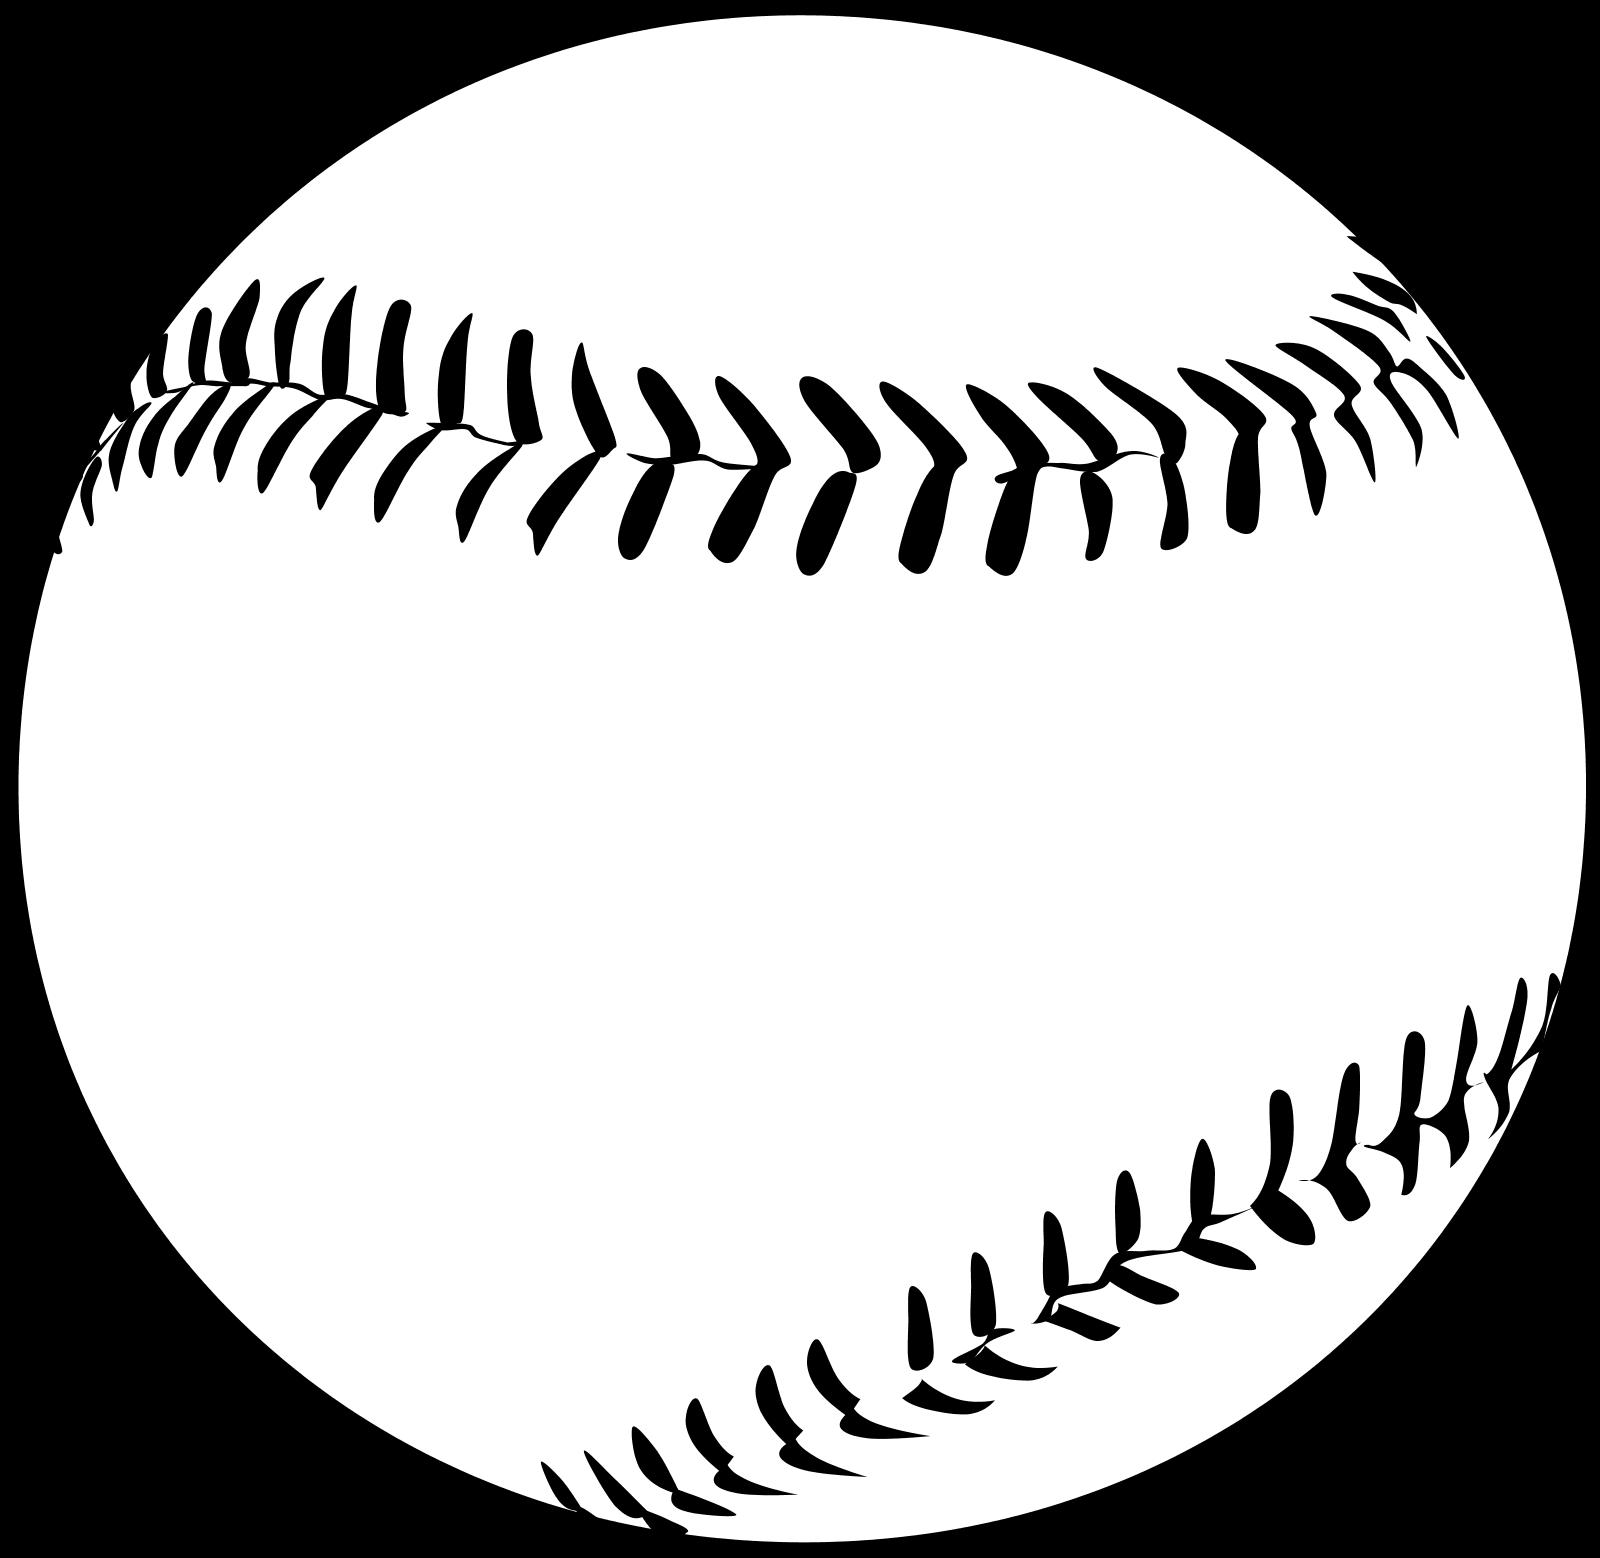 clip art stock Clip art free printable. Baseball clipart.